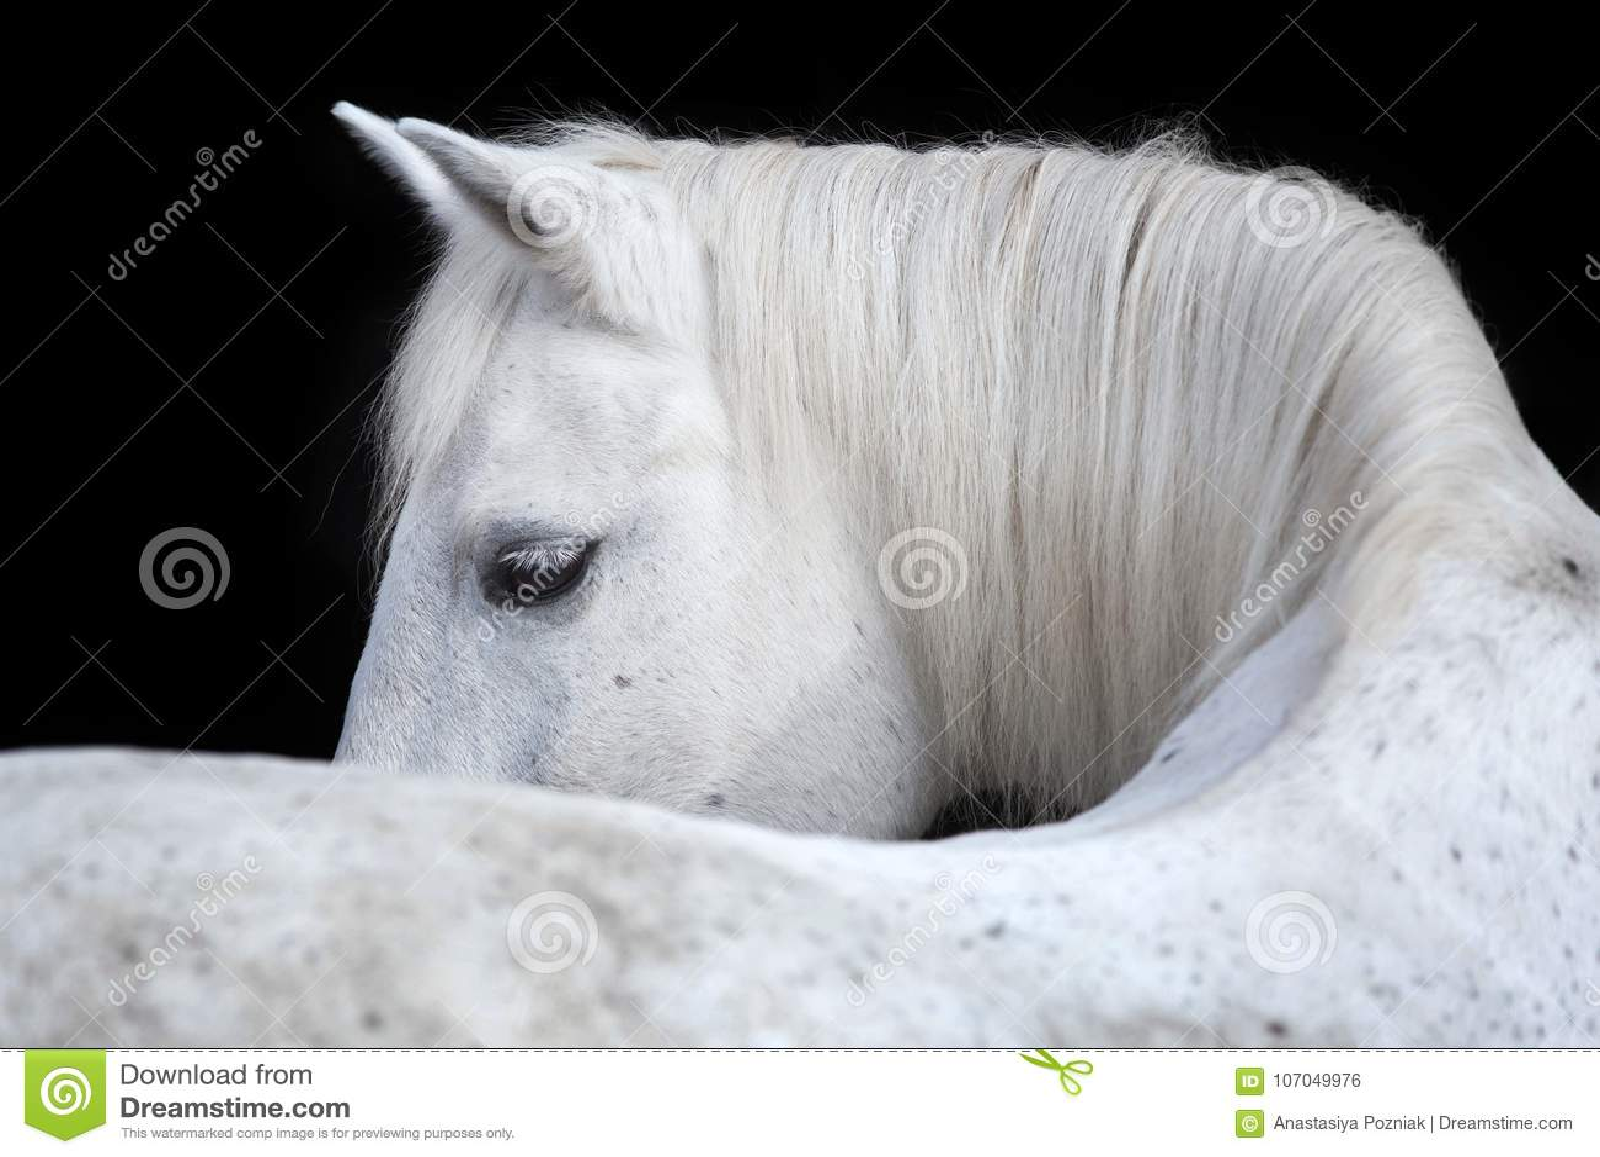 Portrait of an Arabian horse on black background